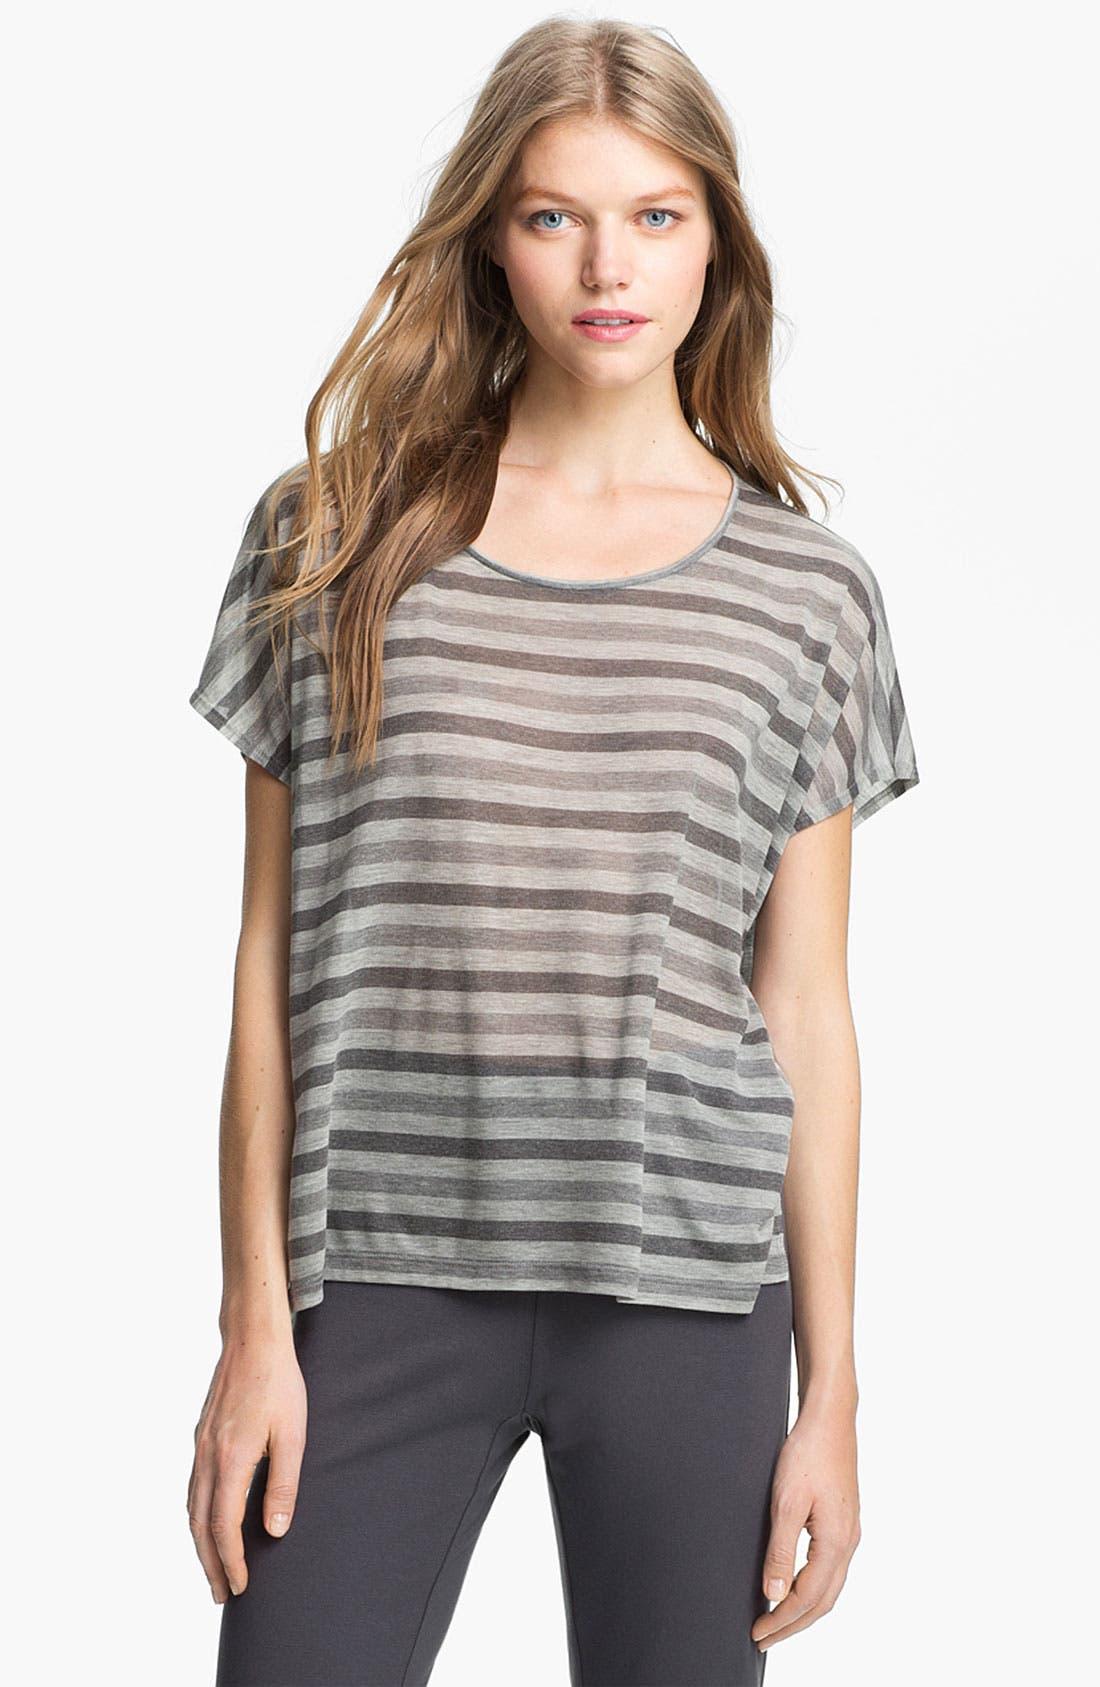 Alternate Image 1 Selected - Eileen Fisher Scoop Neck Stripe Top